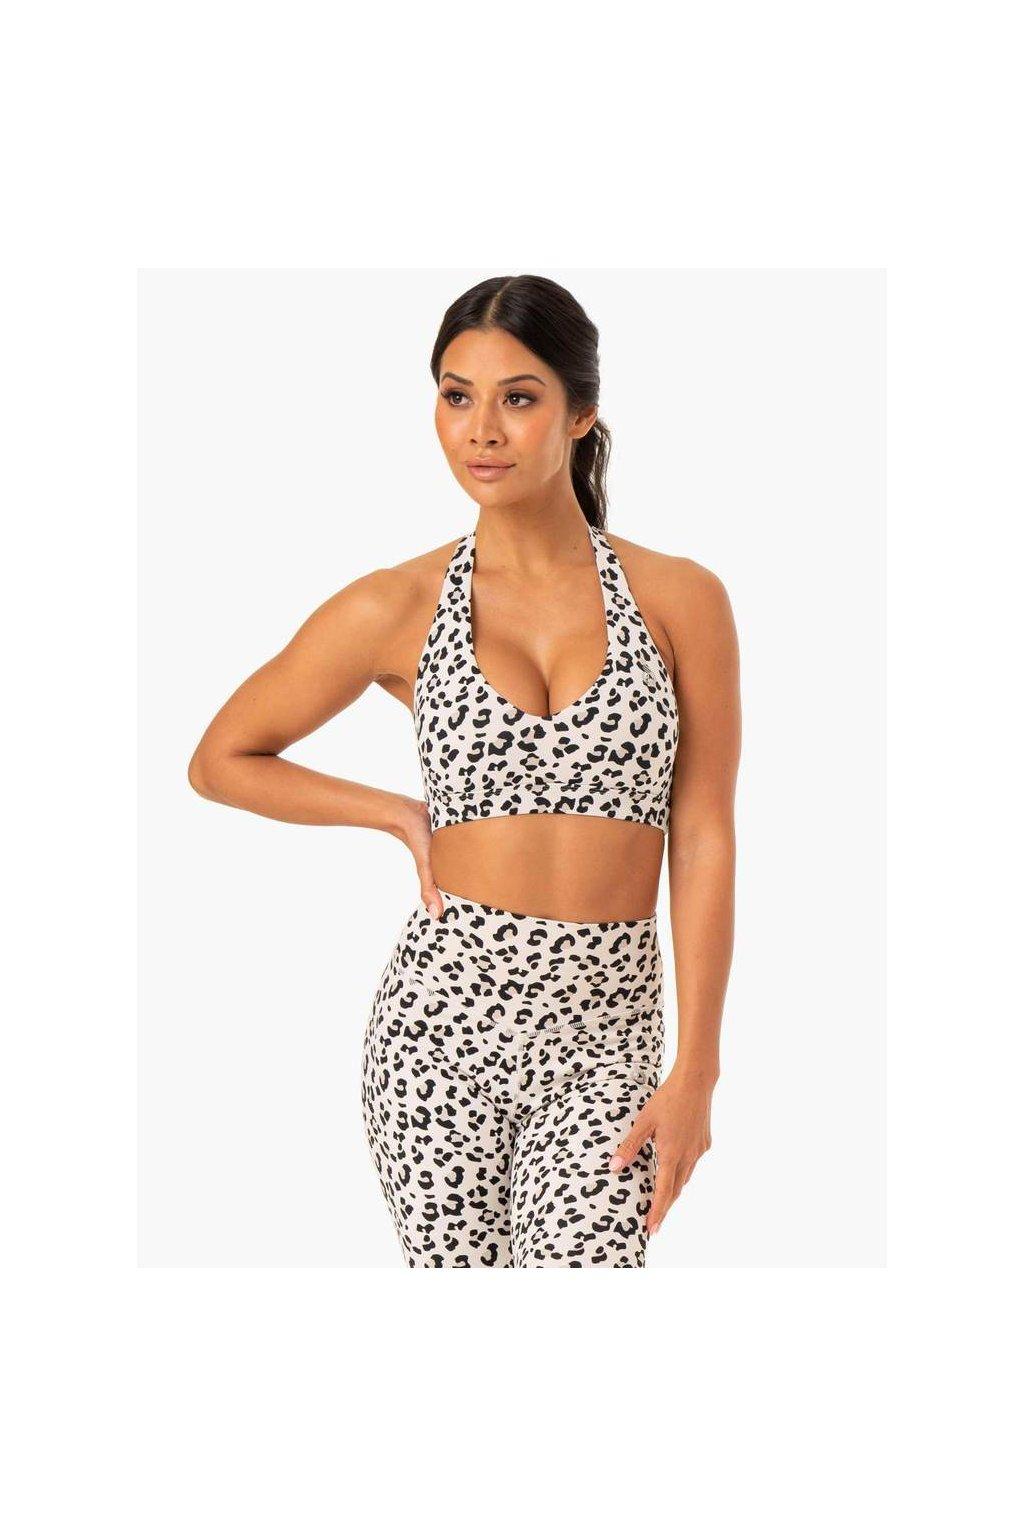 hybrid halter sports bra ivory leopard clothing ryderwear 936659 1000x1000